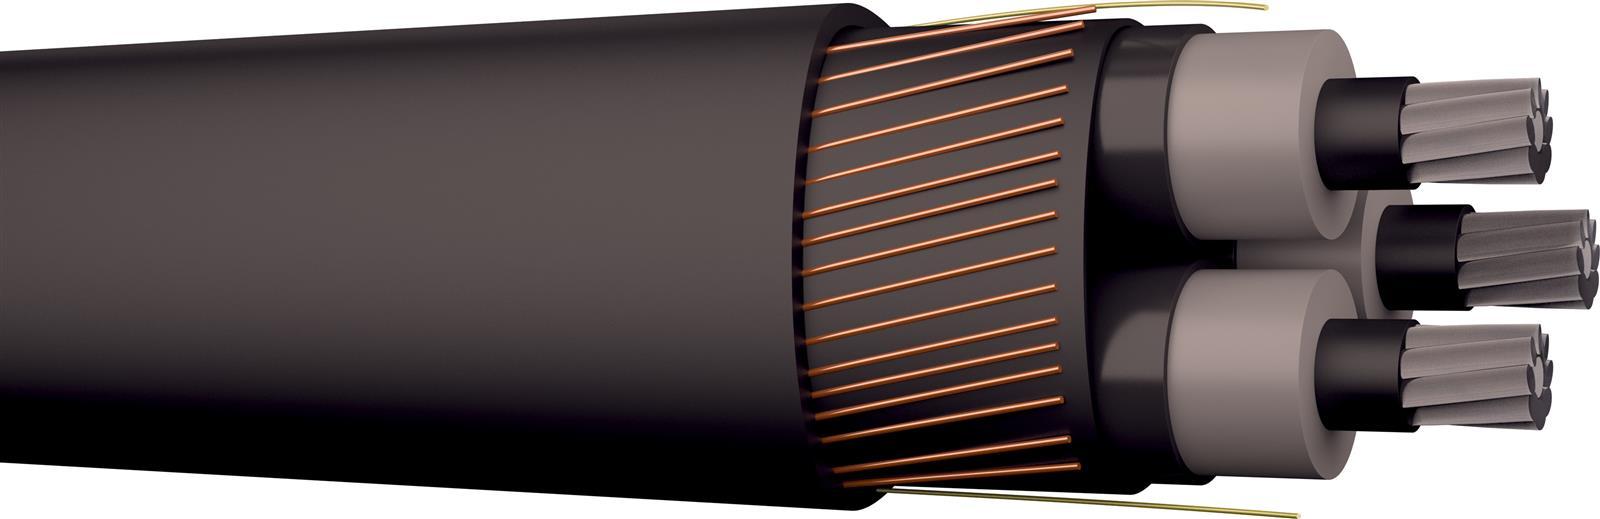 AXLJ-RMF 3X240/35 LT 24KV